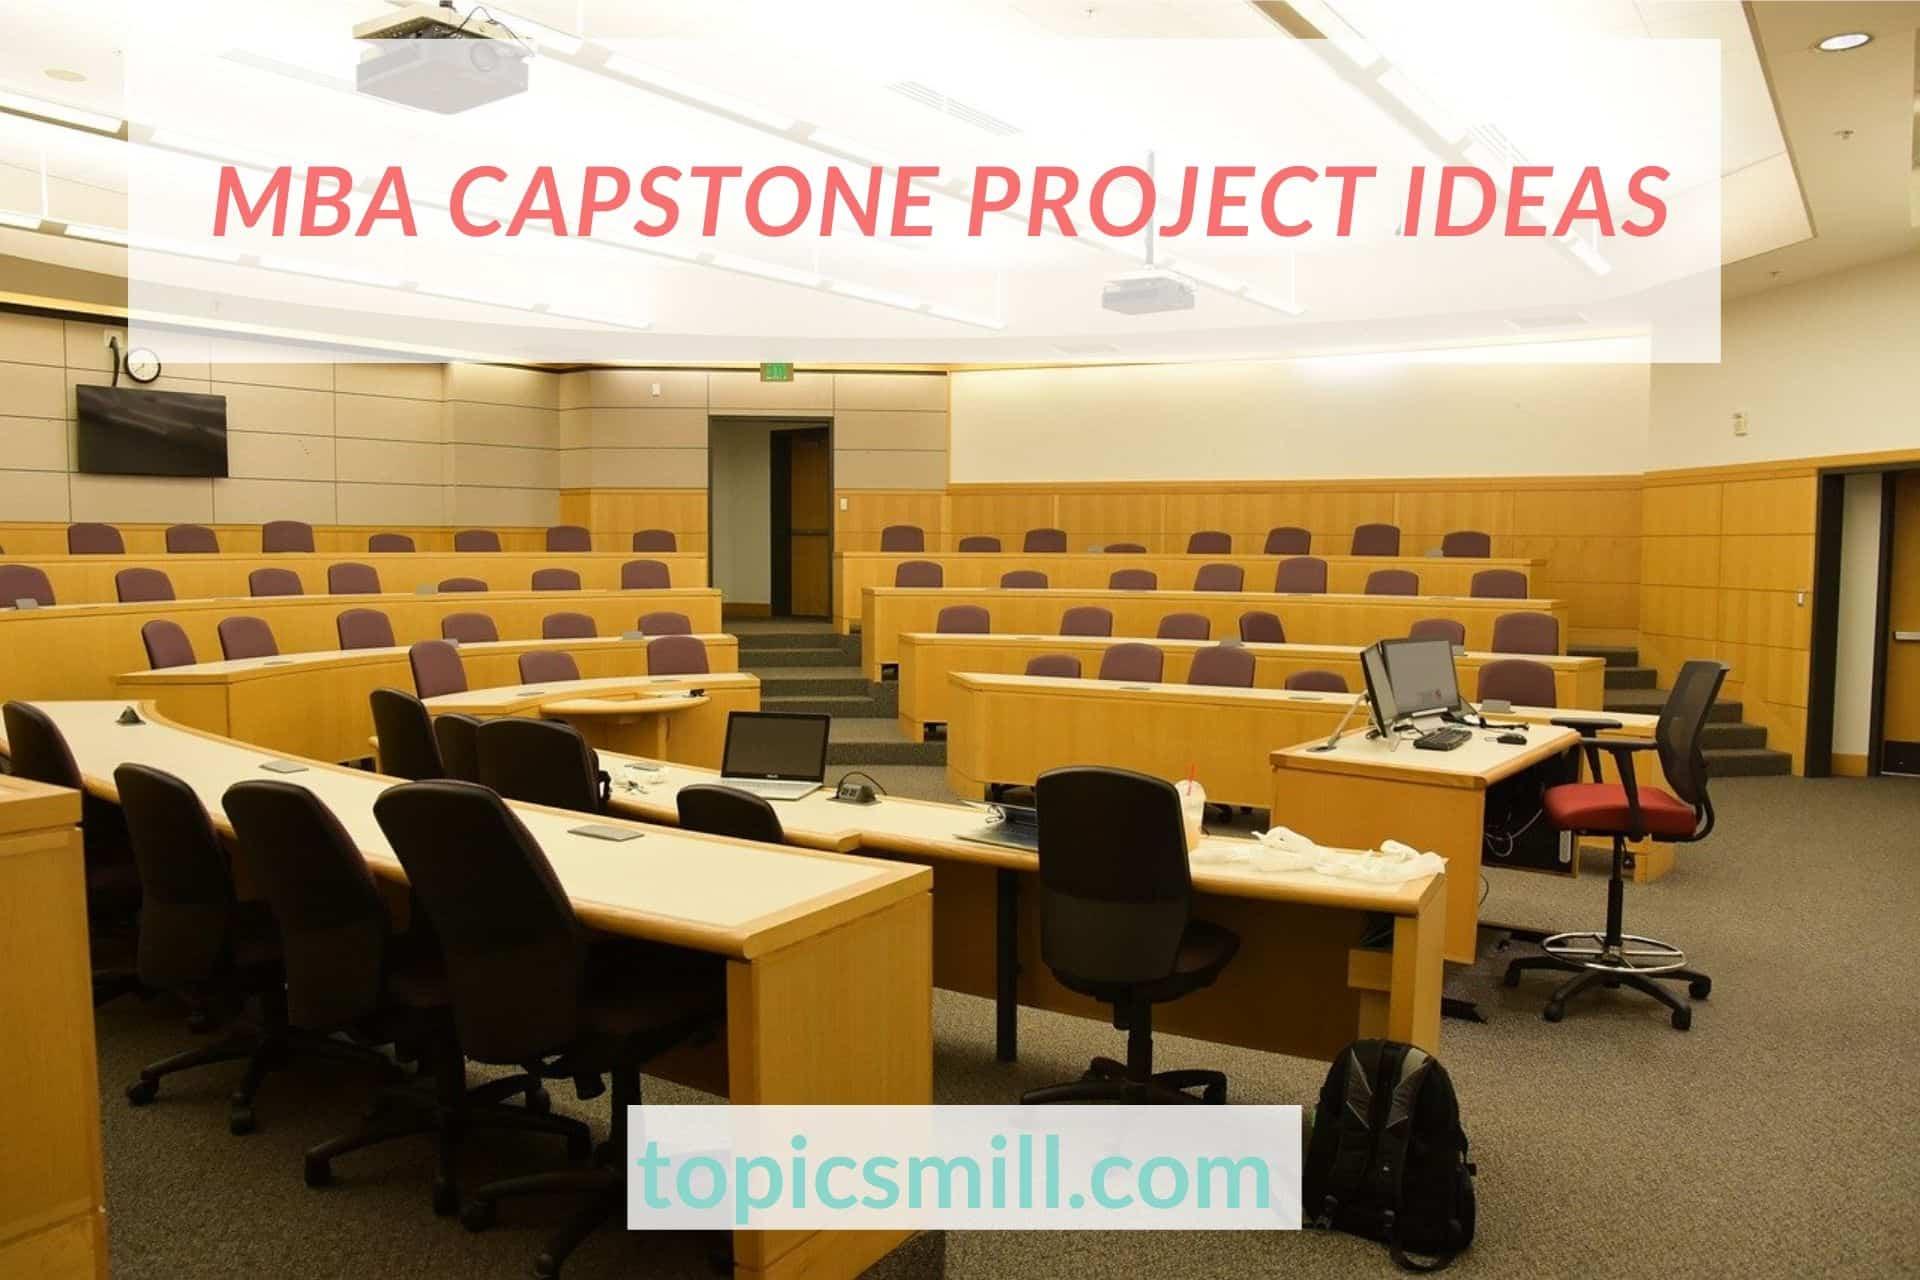 List of 80 MBA Capstone Project Ideas